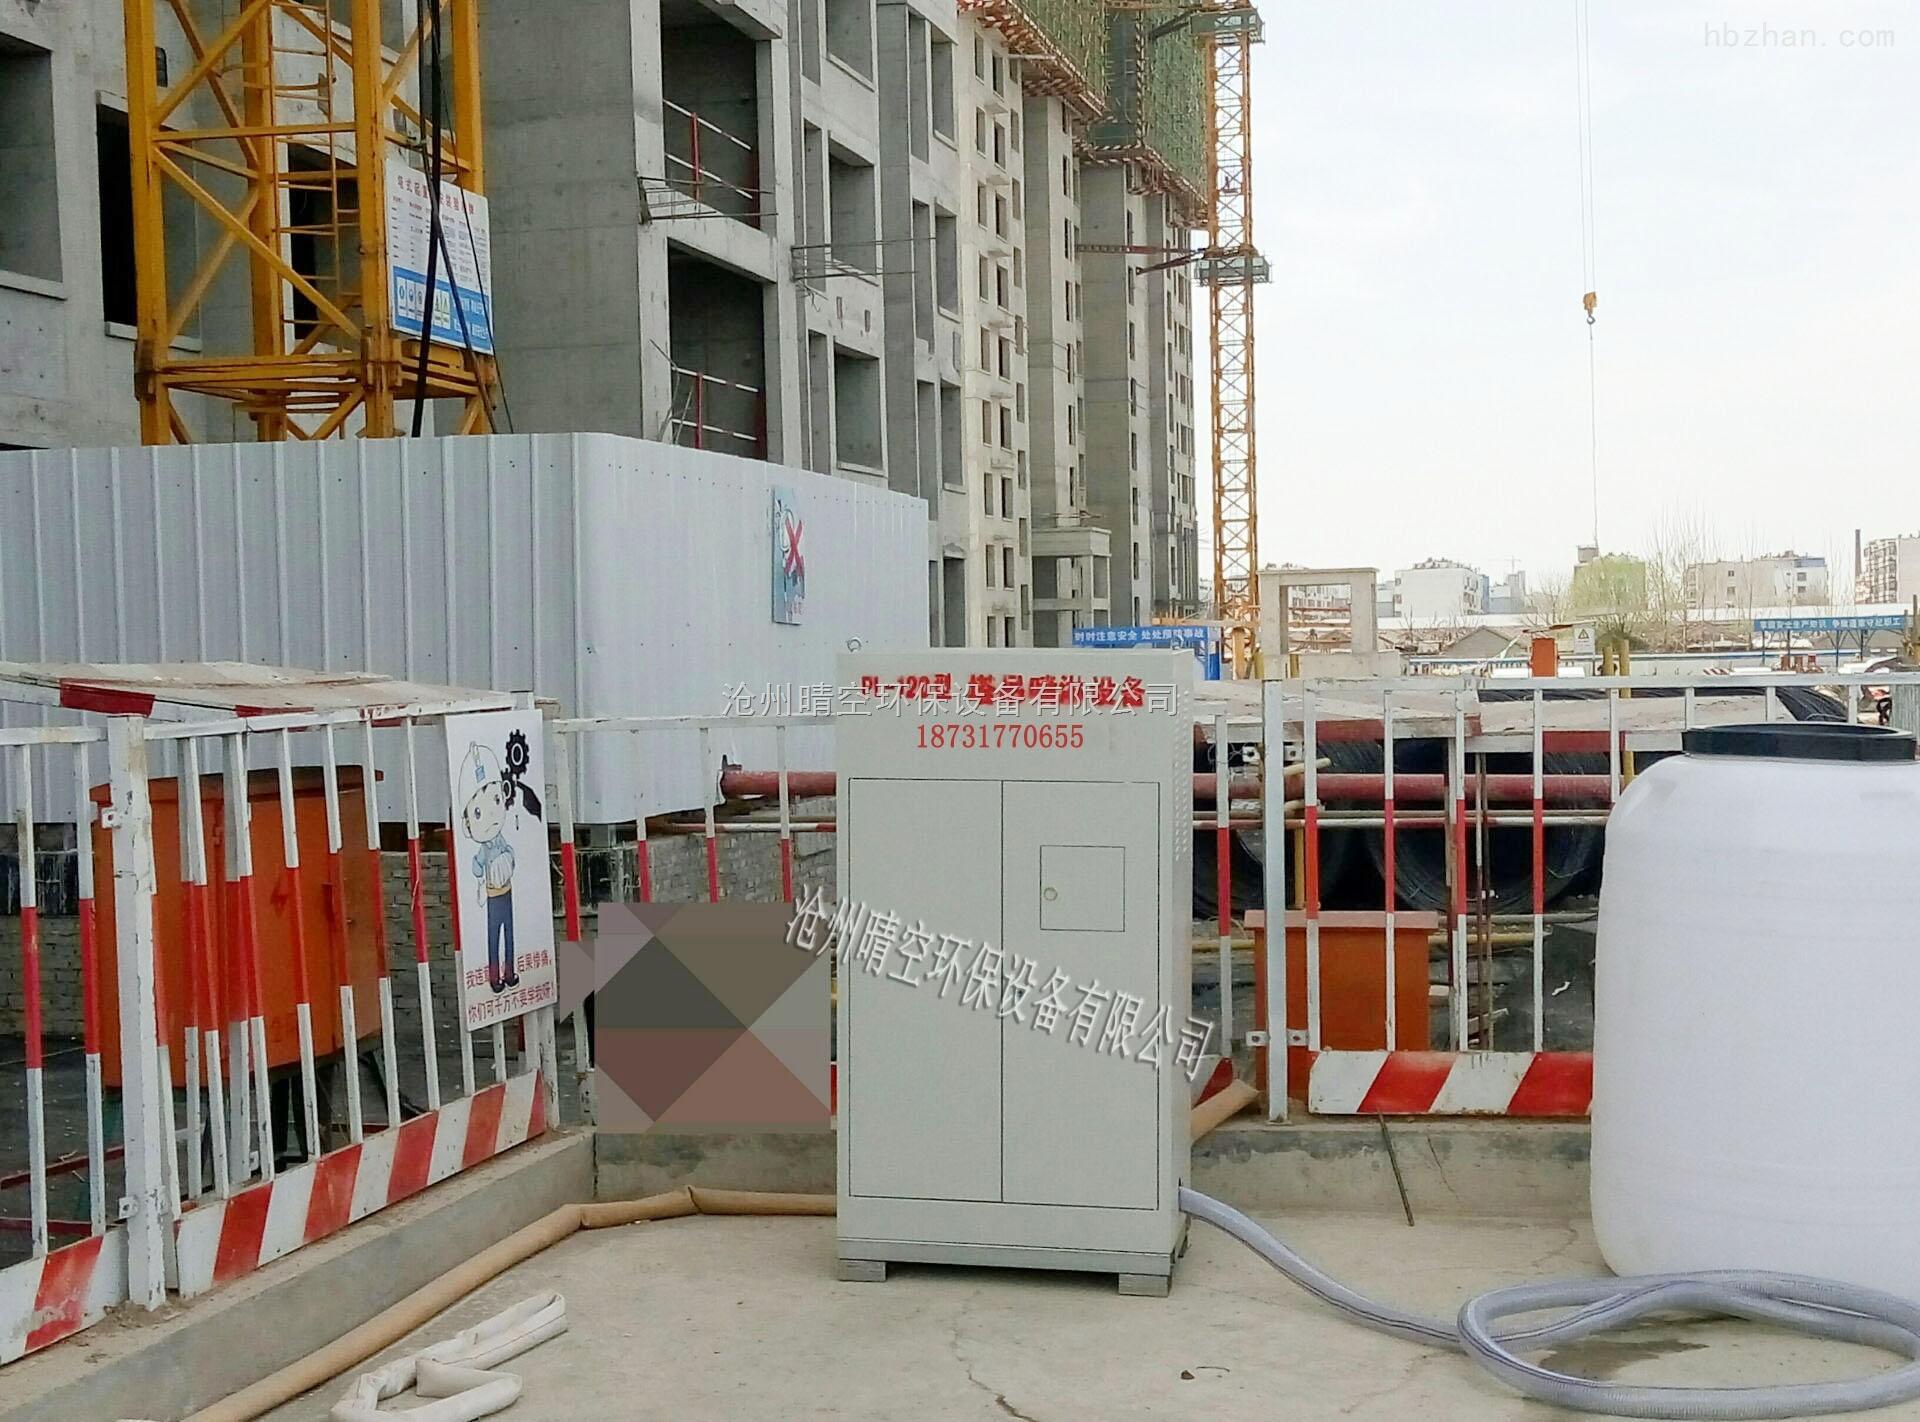 qkpl-150 塔吊喷淋系统,高空塔吊降尘设备